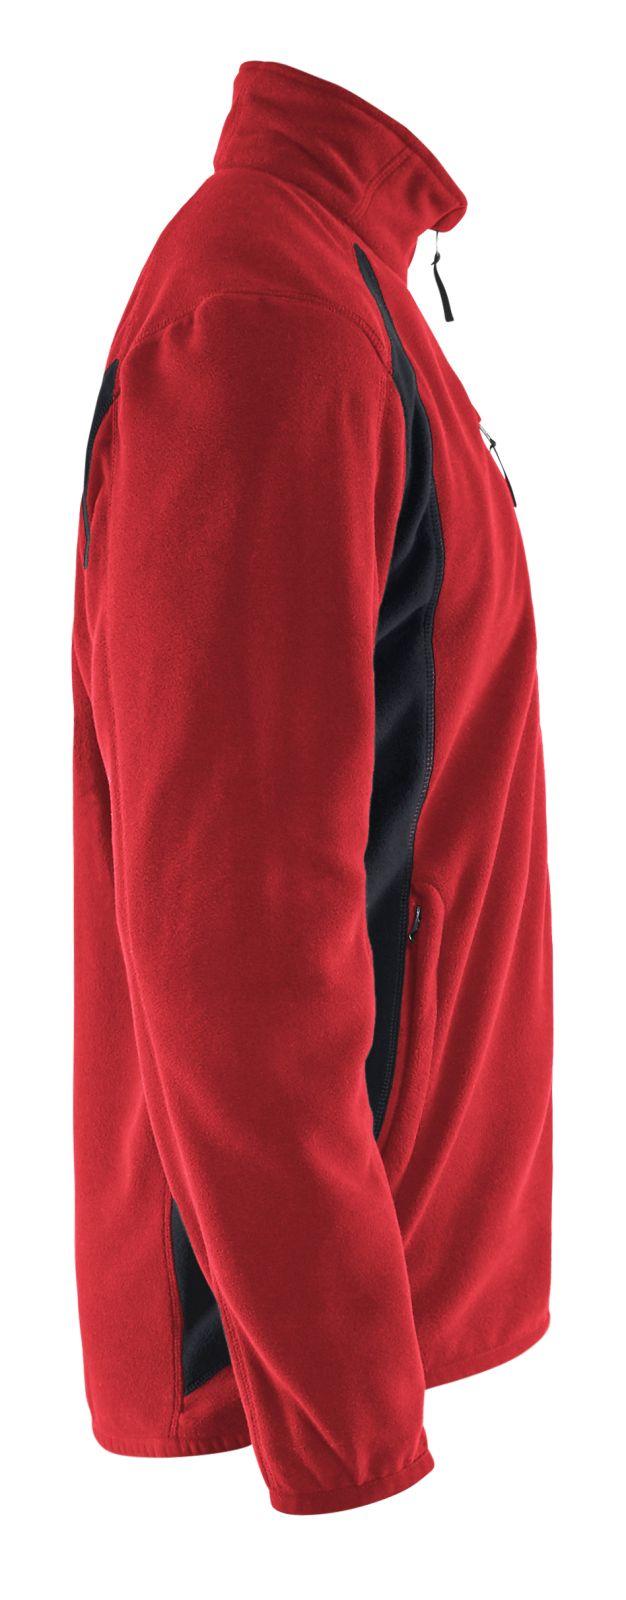 Blaklader Fleece vesten 47302510 rood-zwart(5699)